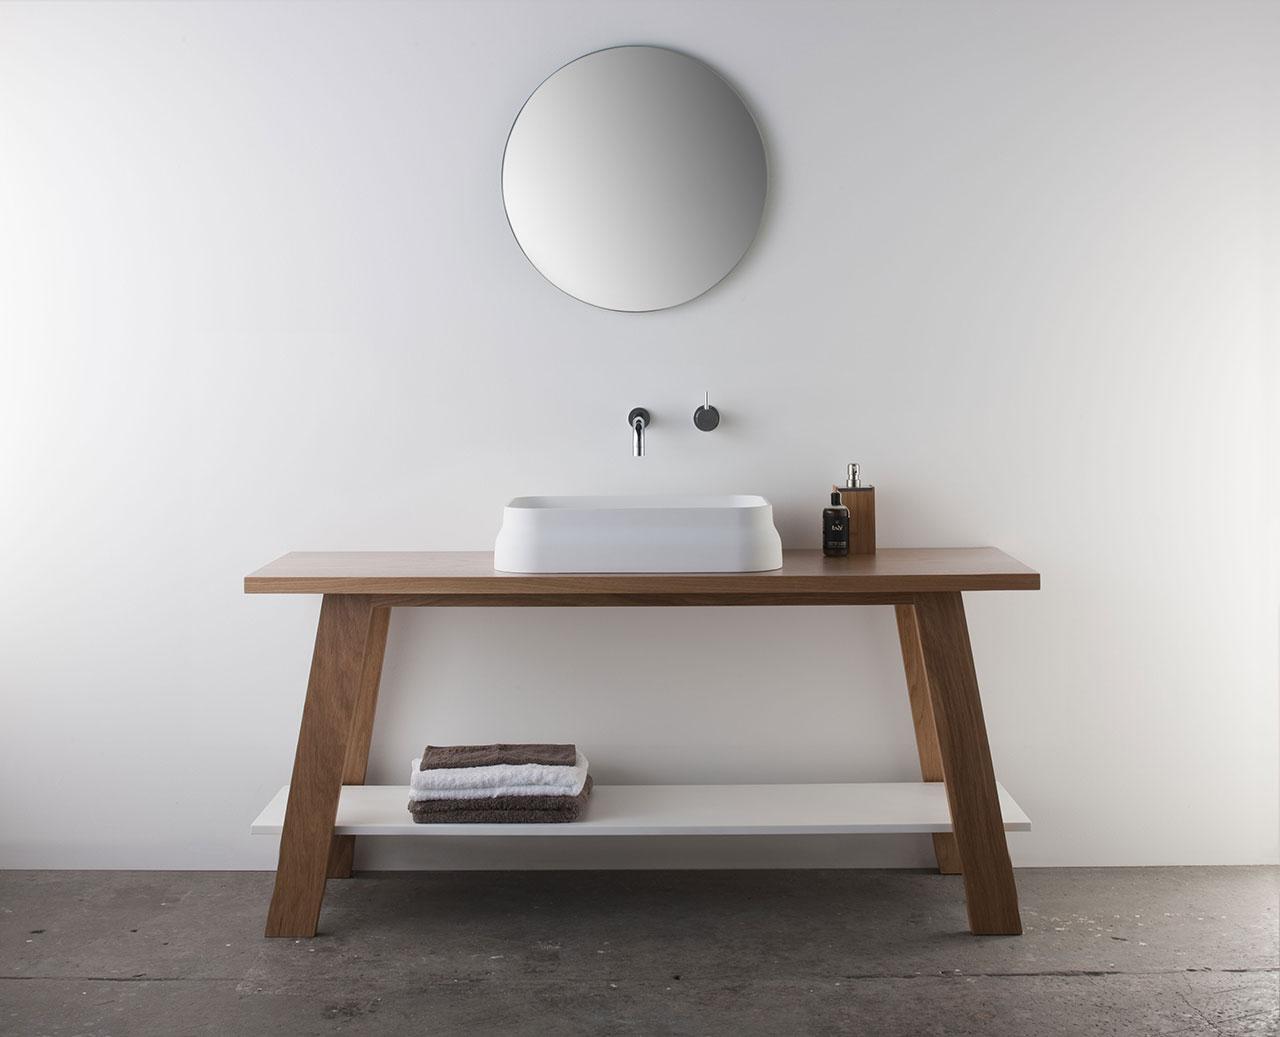 Omvivo | Latis Timber Trestle | Contemporary Bathroom Furniture